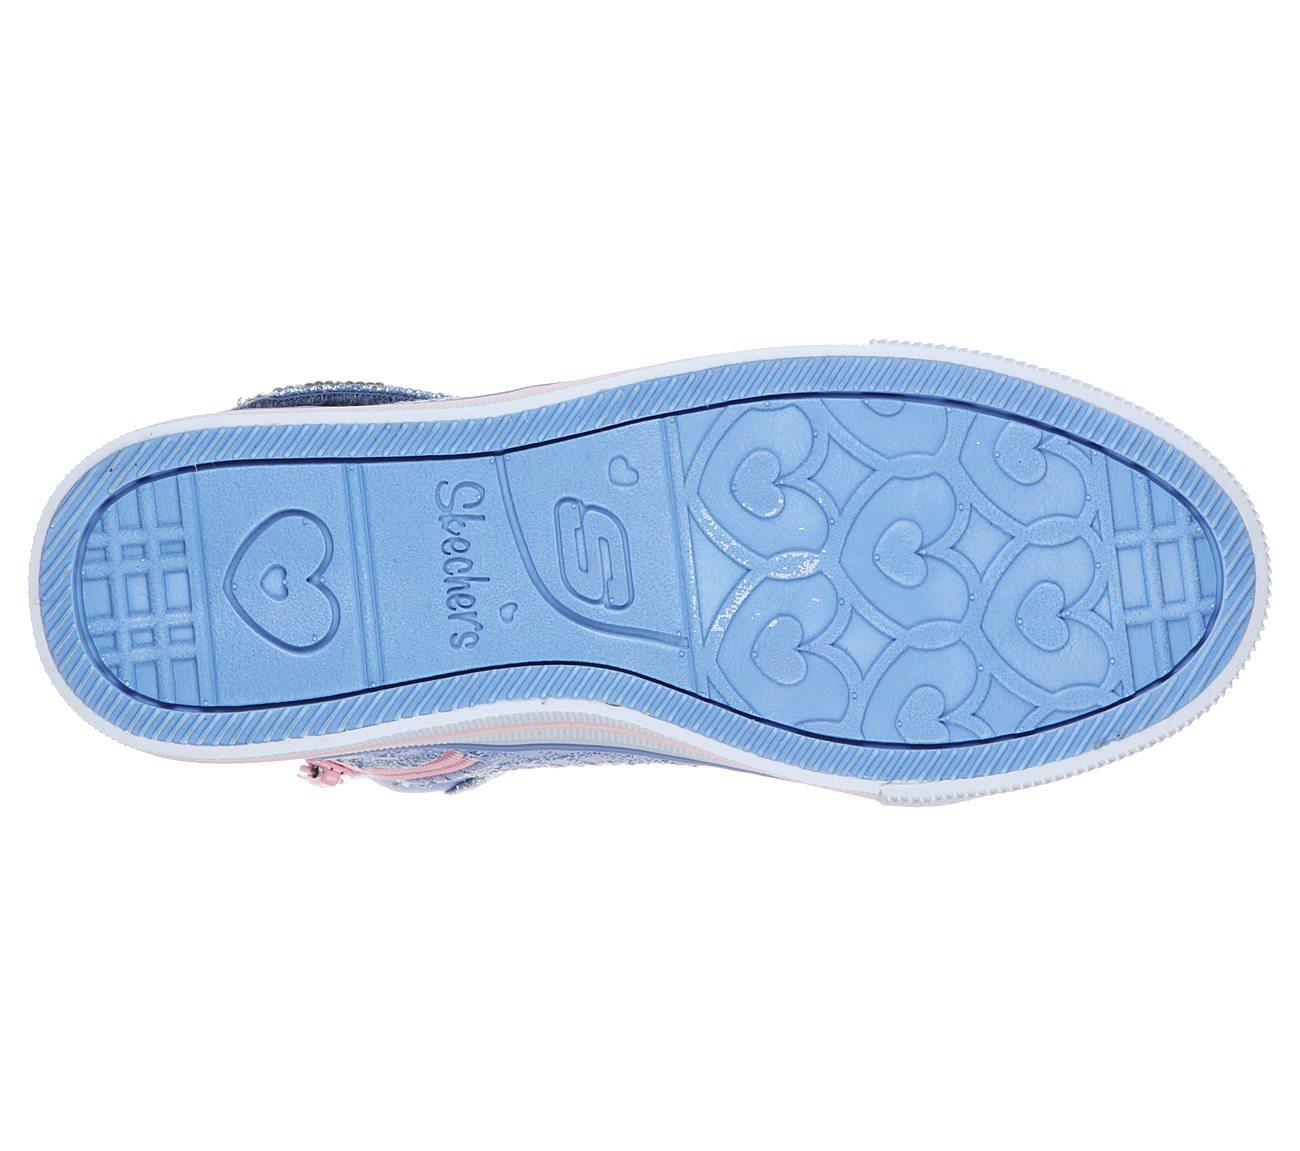 ddac08f767ca Twinkle Toes  Twinkle Lite - Beauty N Bliss. Click tap to zoom · Alternate  View 1. Alternate View 2. Alternate View 3